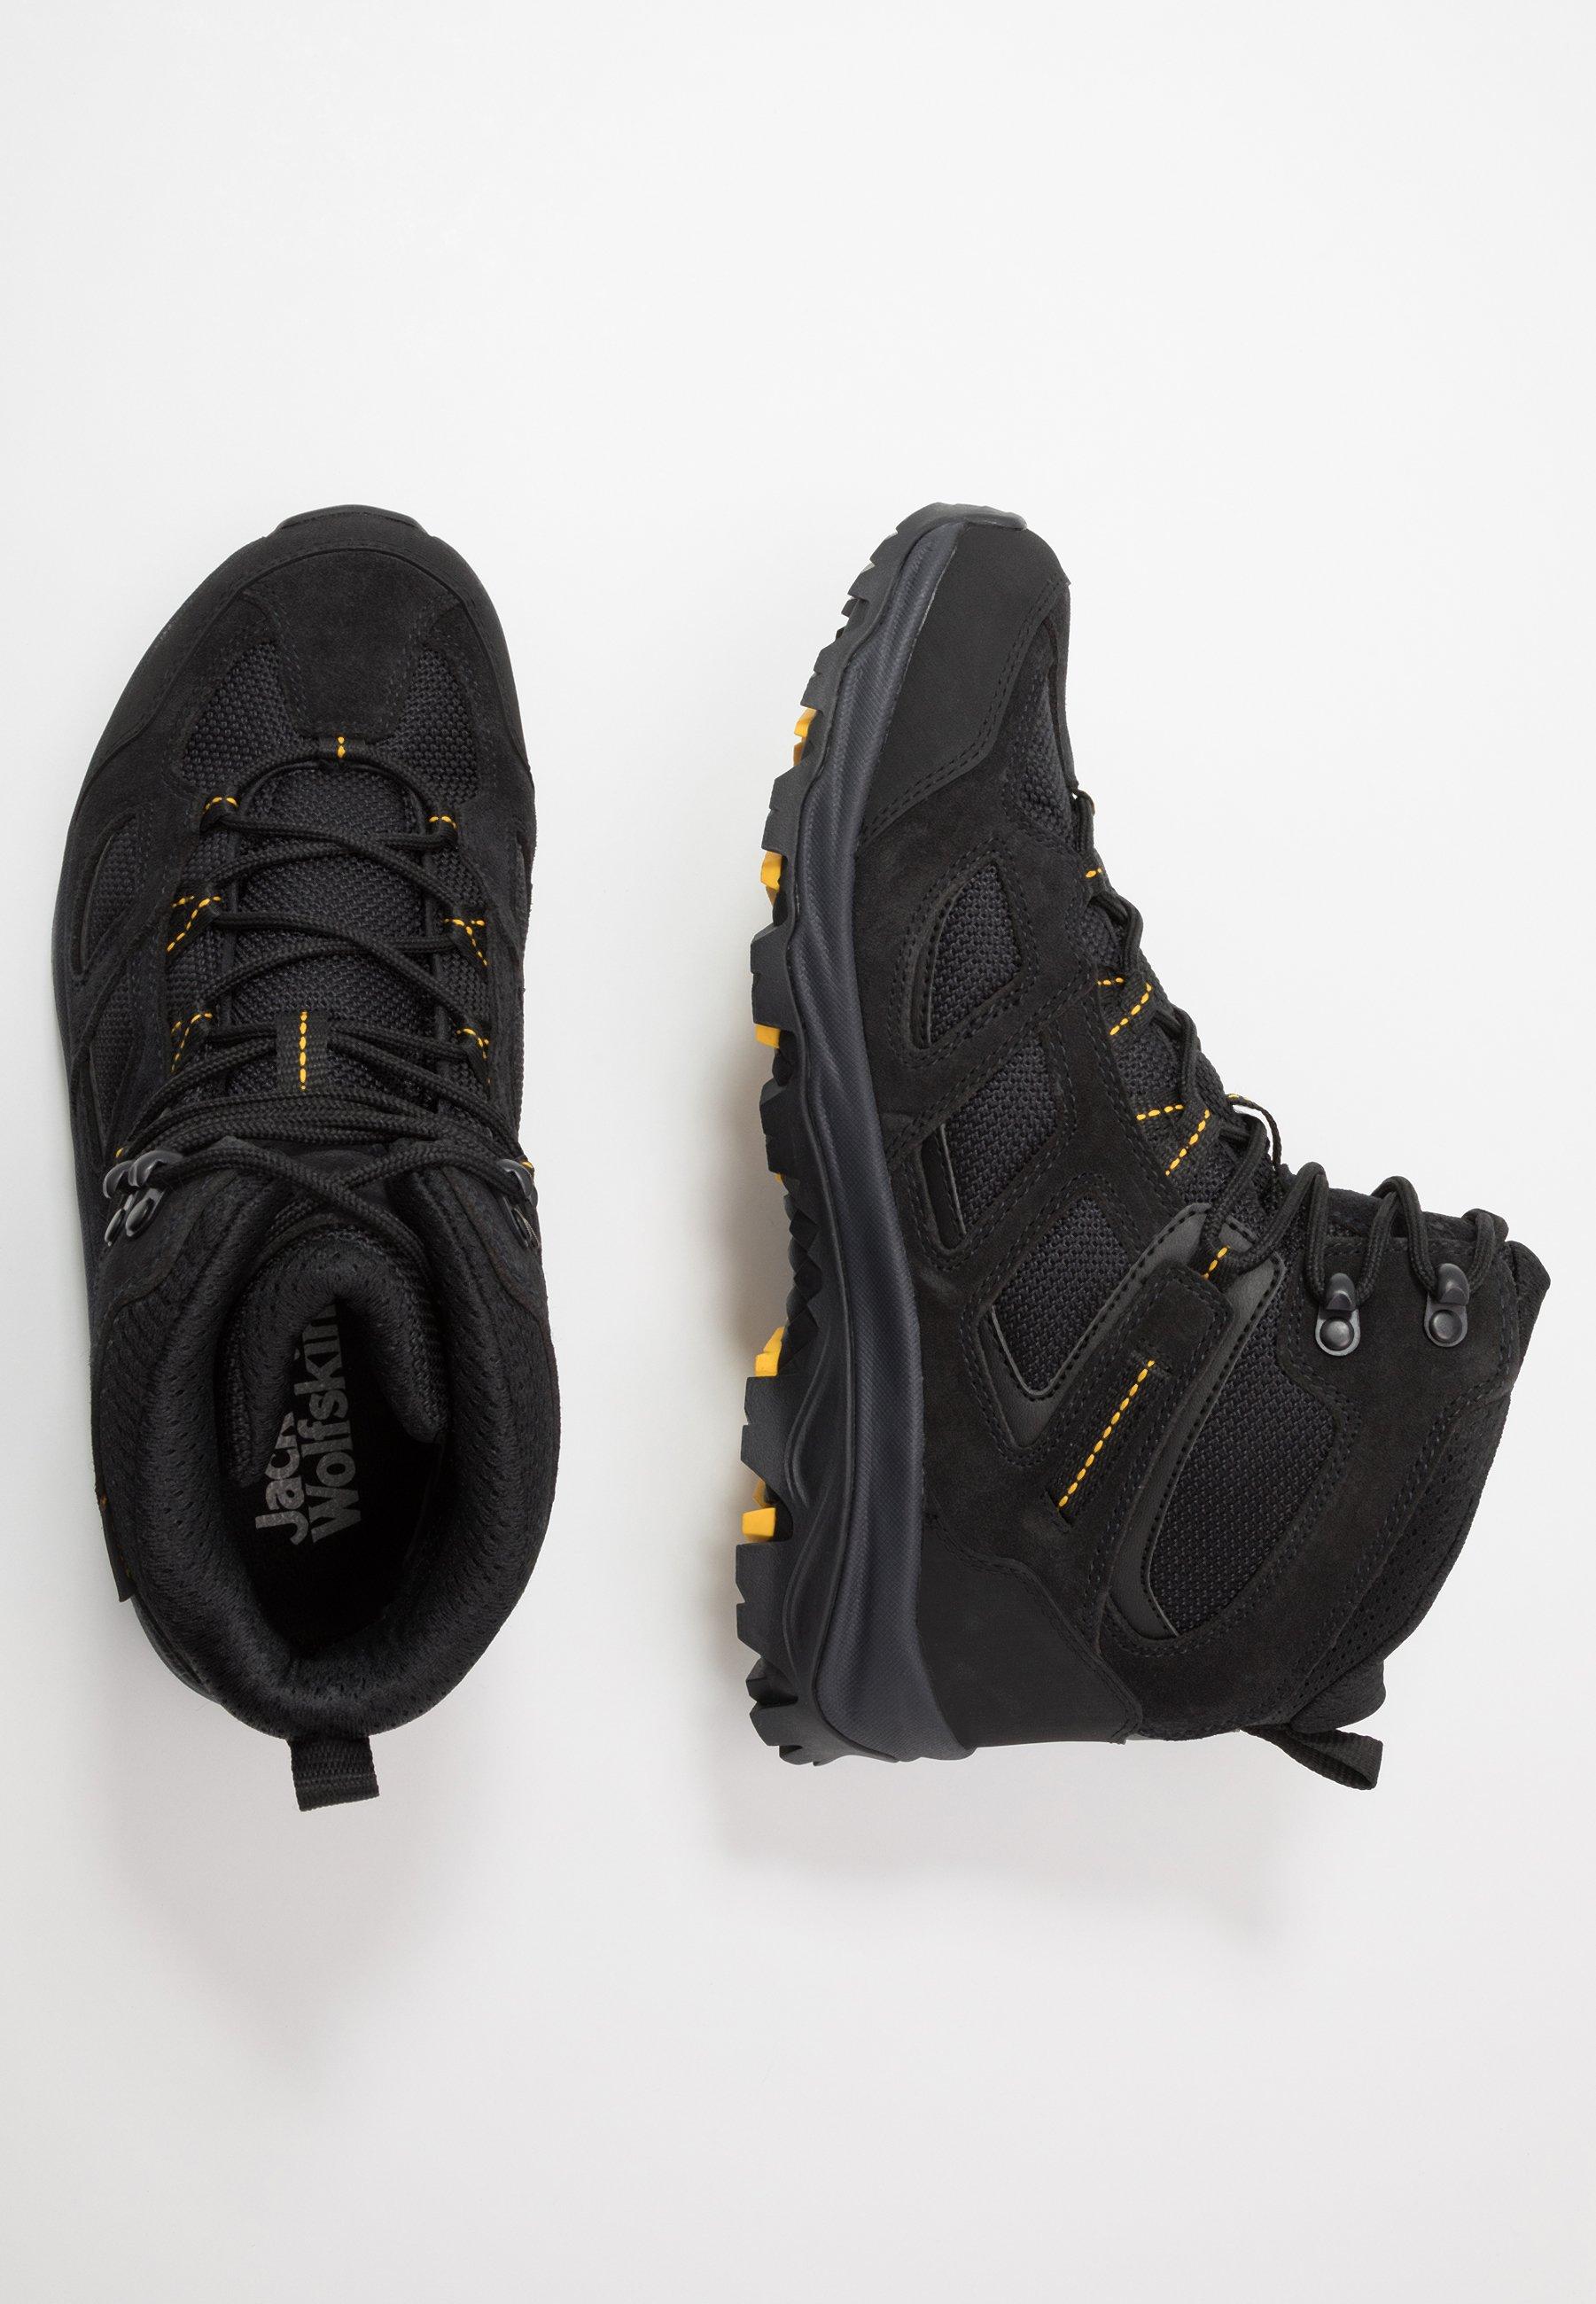 Jack Wolfskin VOJO 3 TEXAPORE MID - Hiking shoes - black/burly yellow